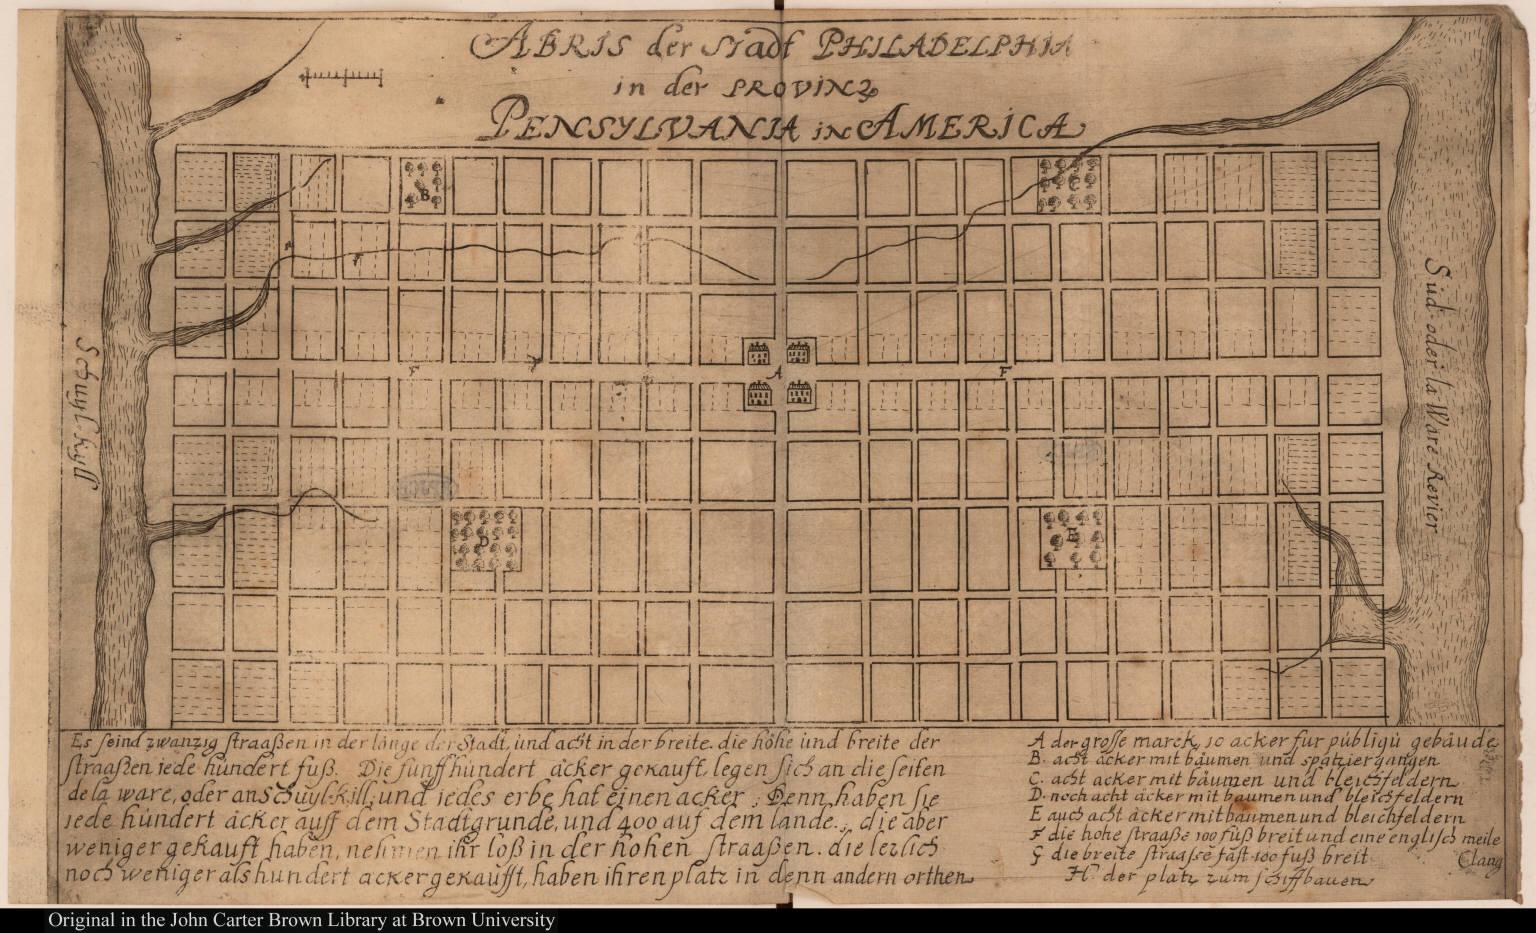 Abris der stadt Philadelphia in der provinz Pensylvania in America